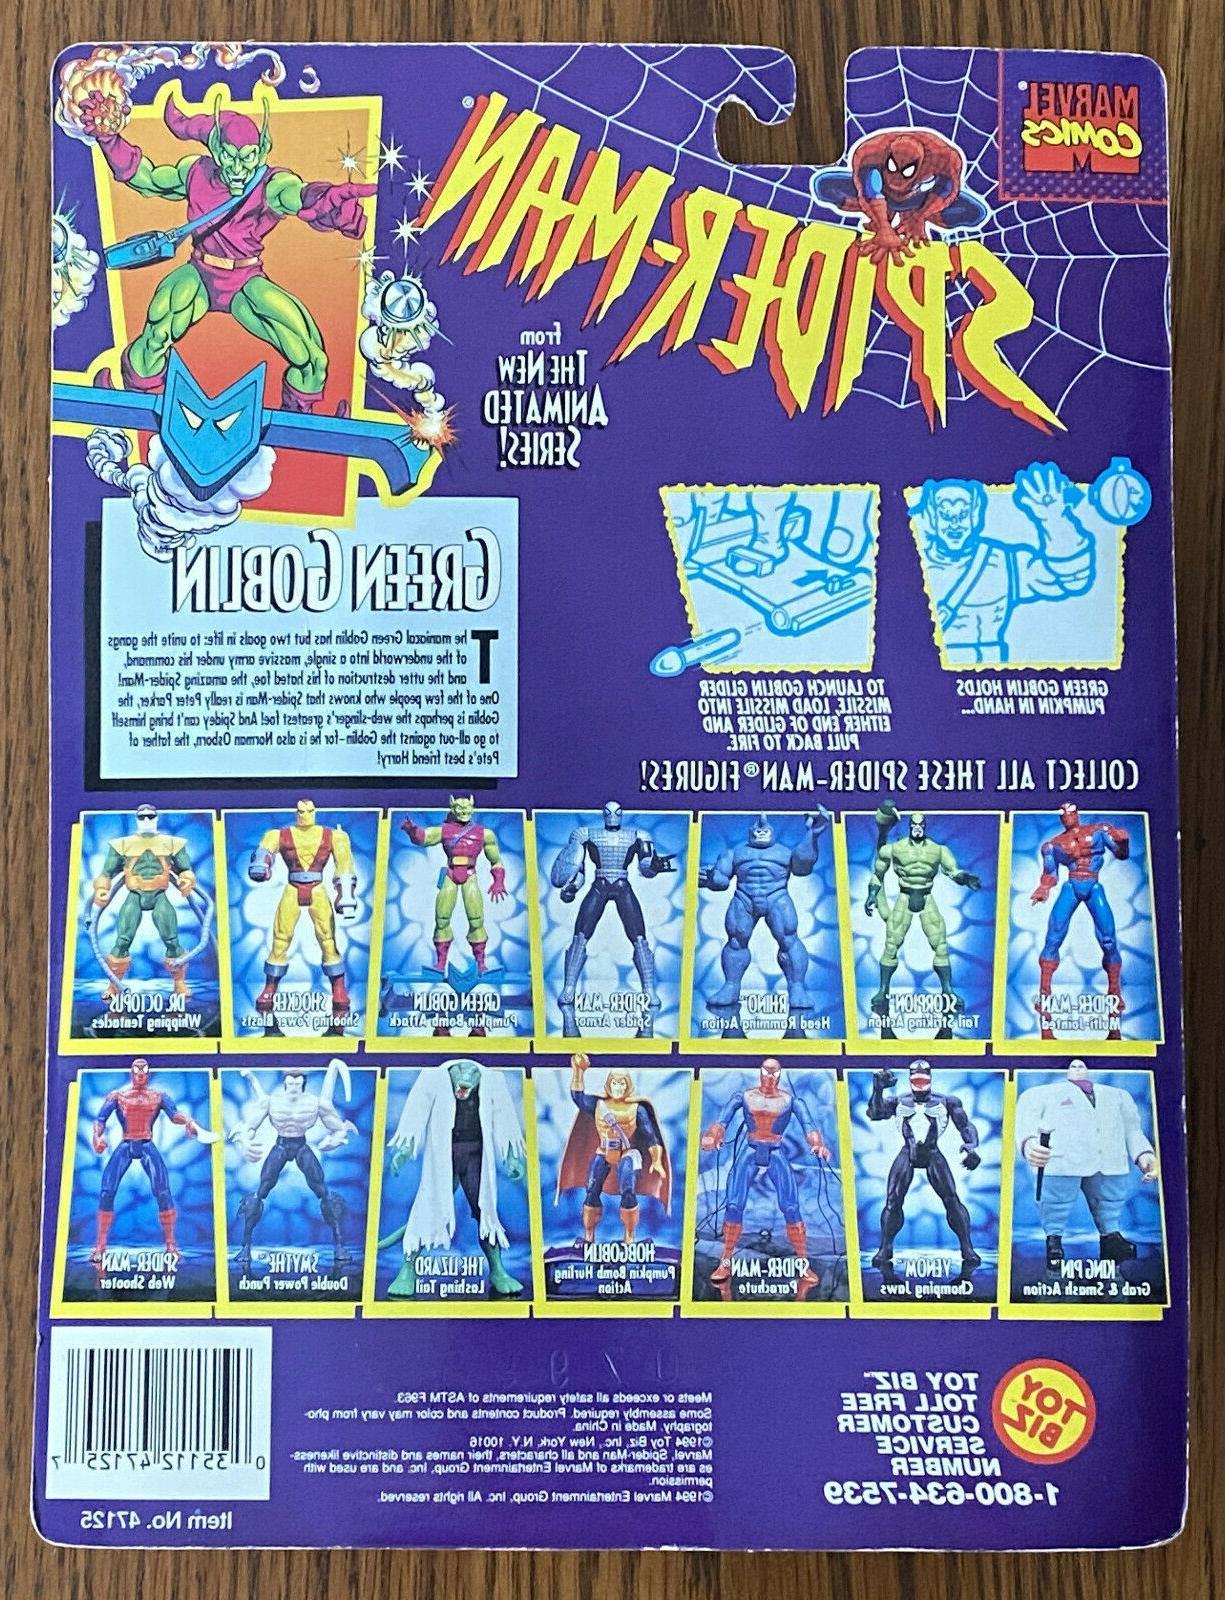 NEW GOBLIN 1994 ACTION SPIDER-MAN Comics